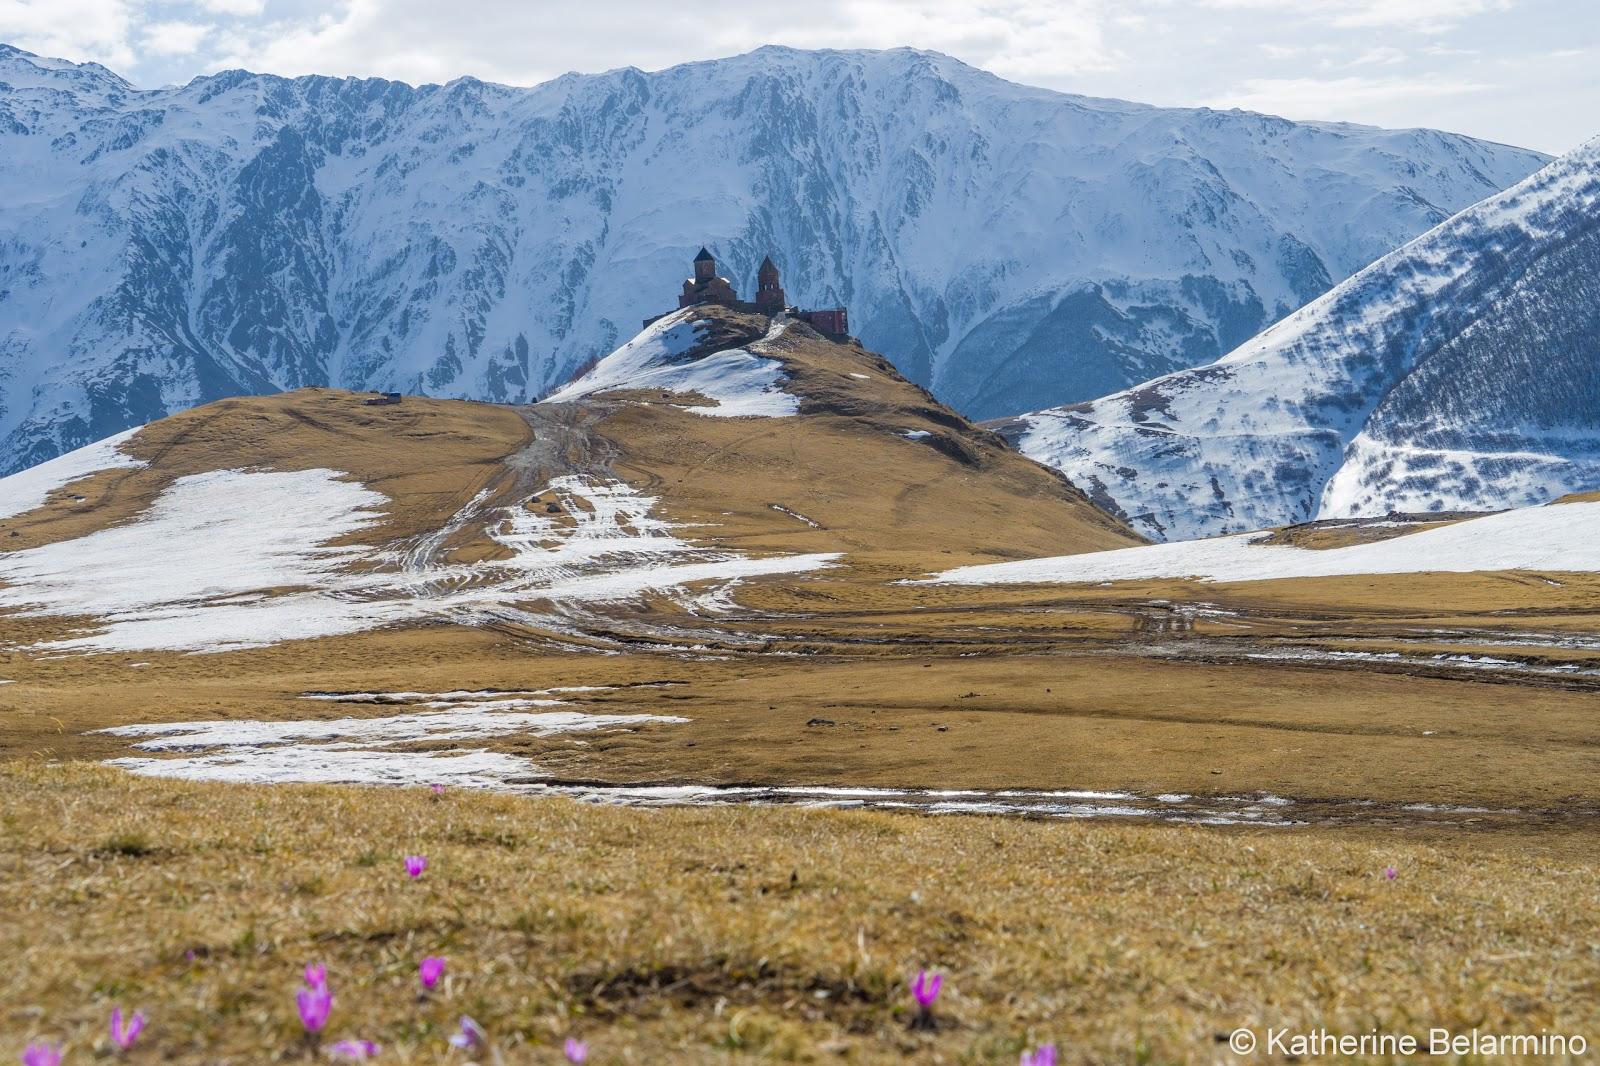 MegaTransCaucasus 2017: through the mountains to the sea. Part 7. Home for Aishham